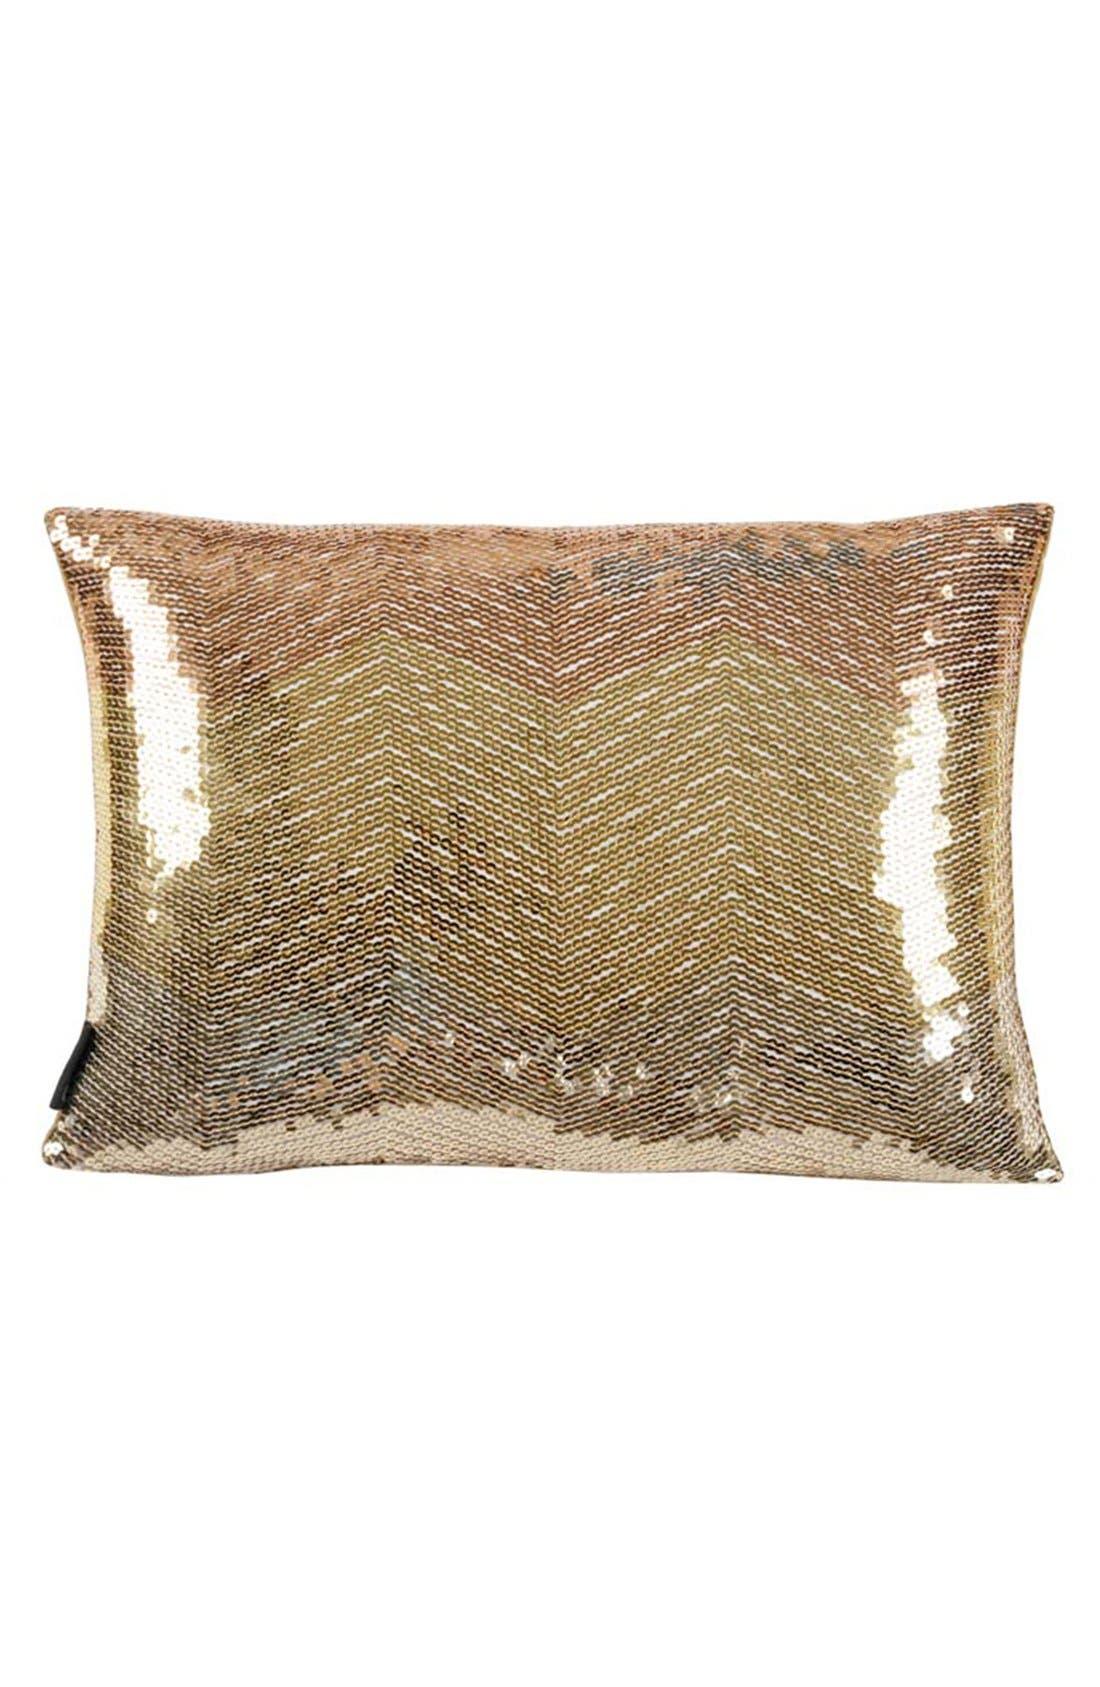 Main Image - Blissliving Home 'Sasha' Sequin Pillow